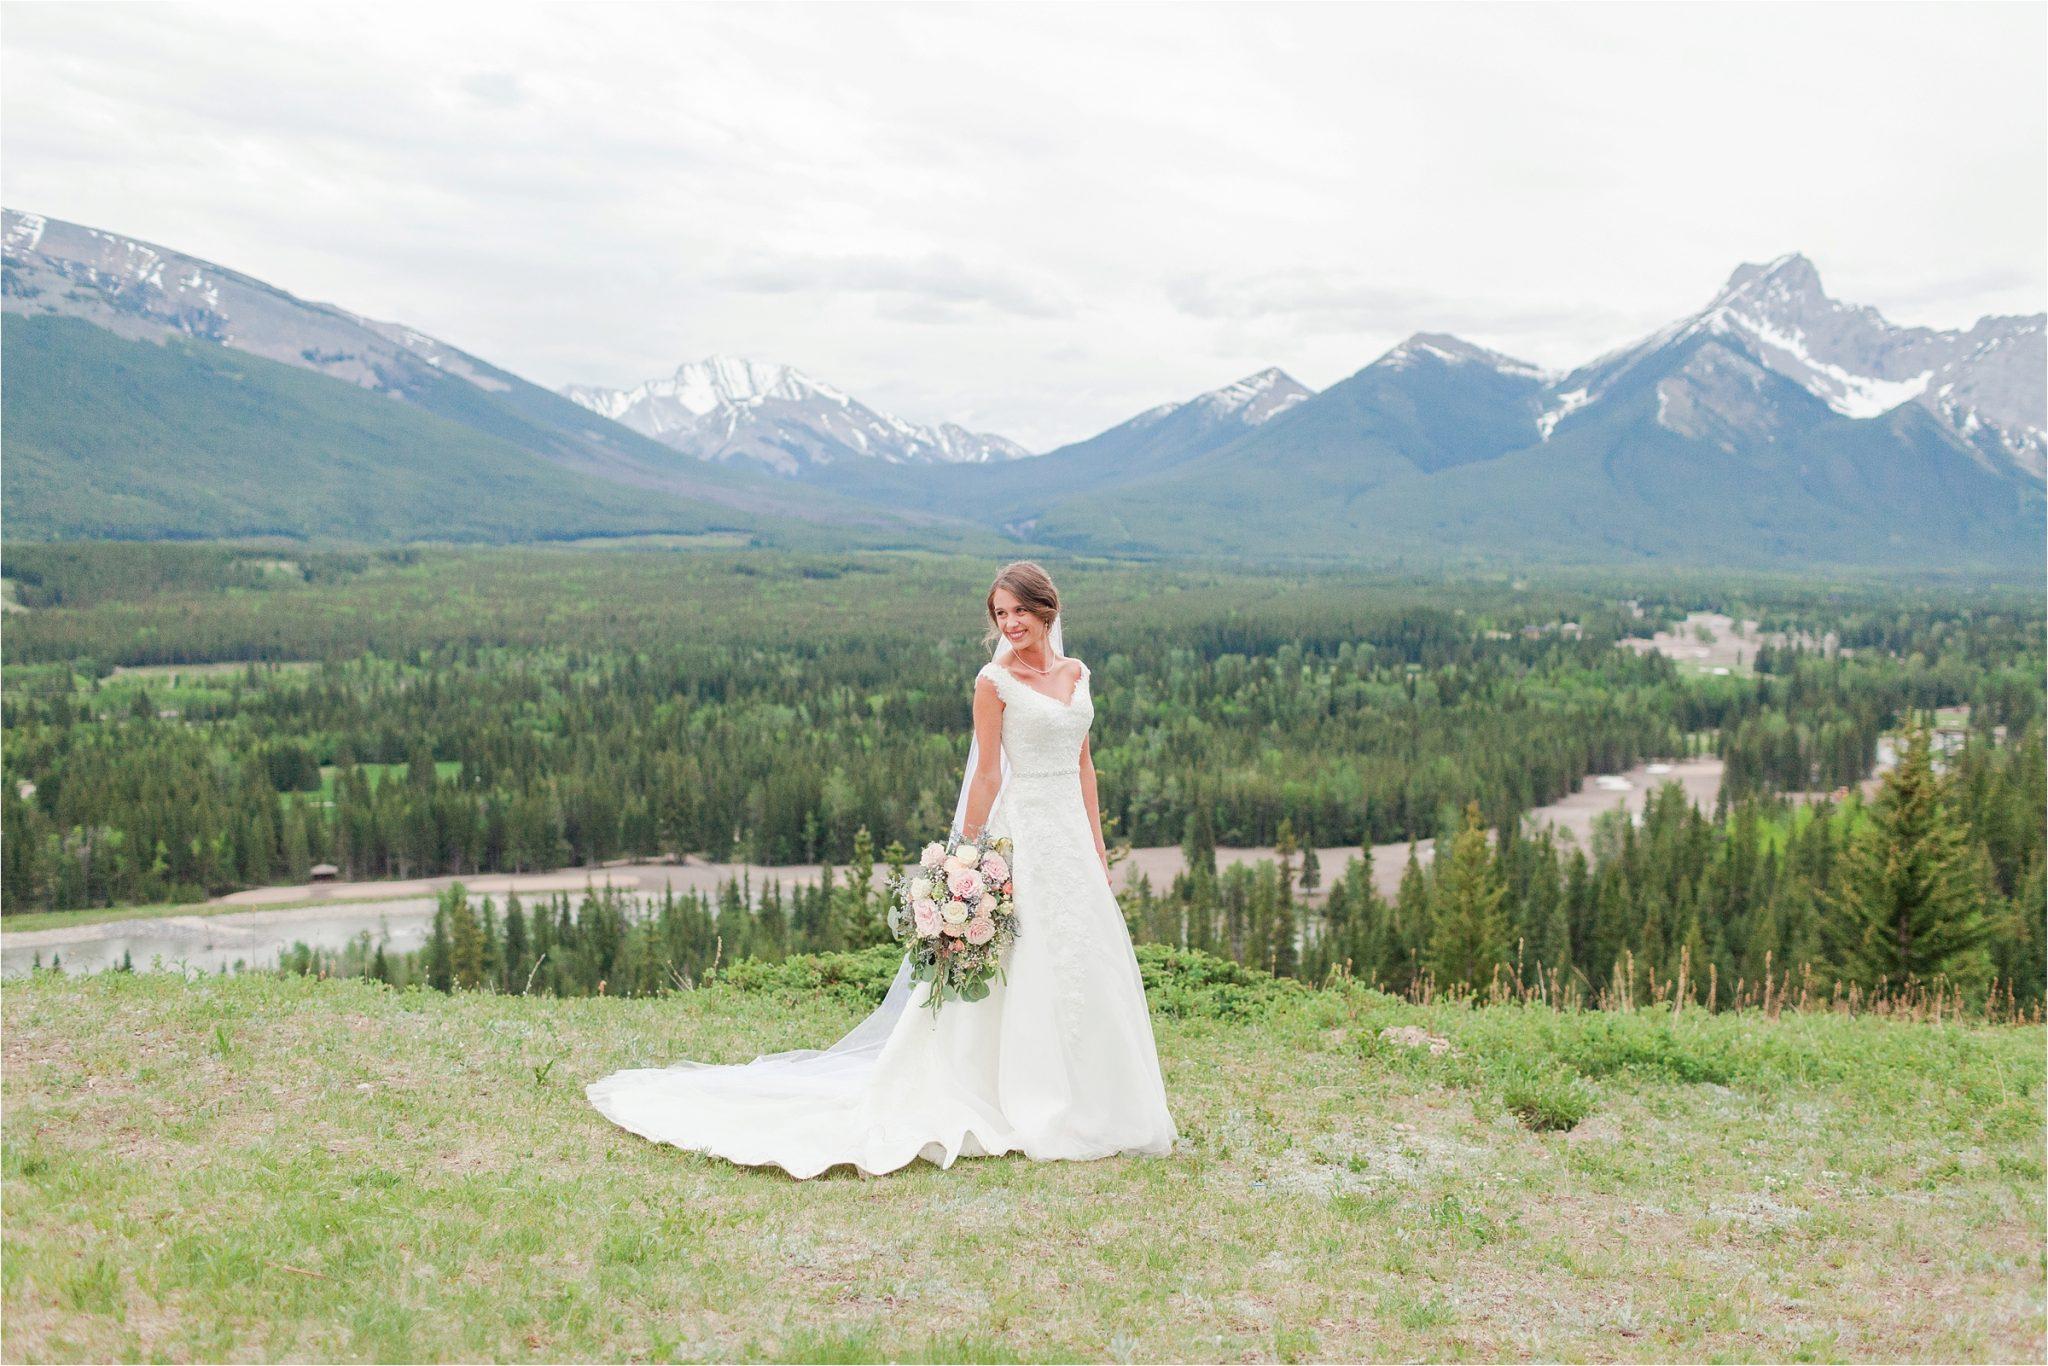 Kananaskis Canada Wedding at the Delta Lodge-Kaitlin & Ricky-Alabama wedding photographer-Lodge wedding-Bridal photography-Canada bride-Mountain wedding